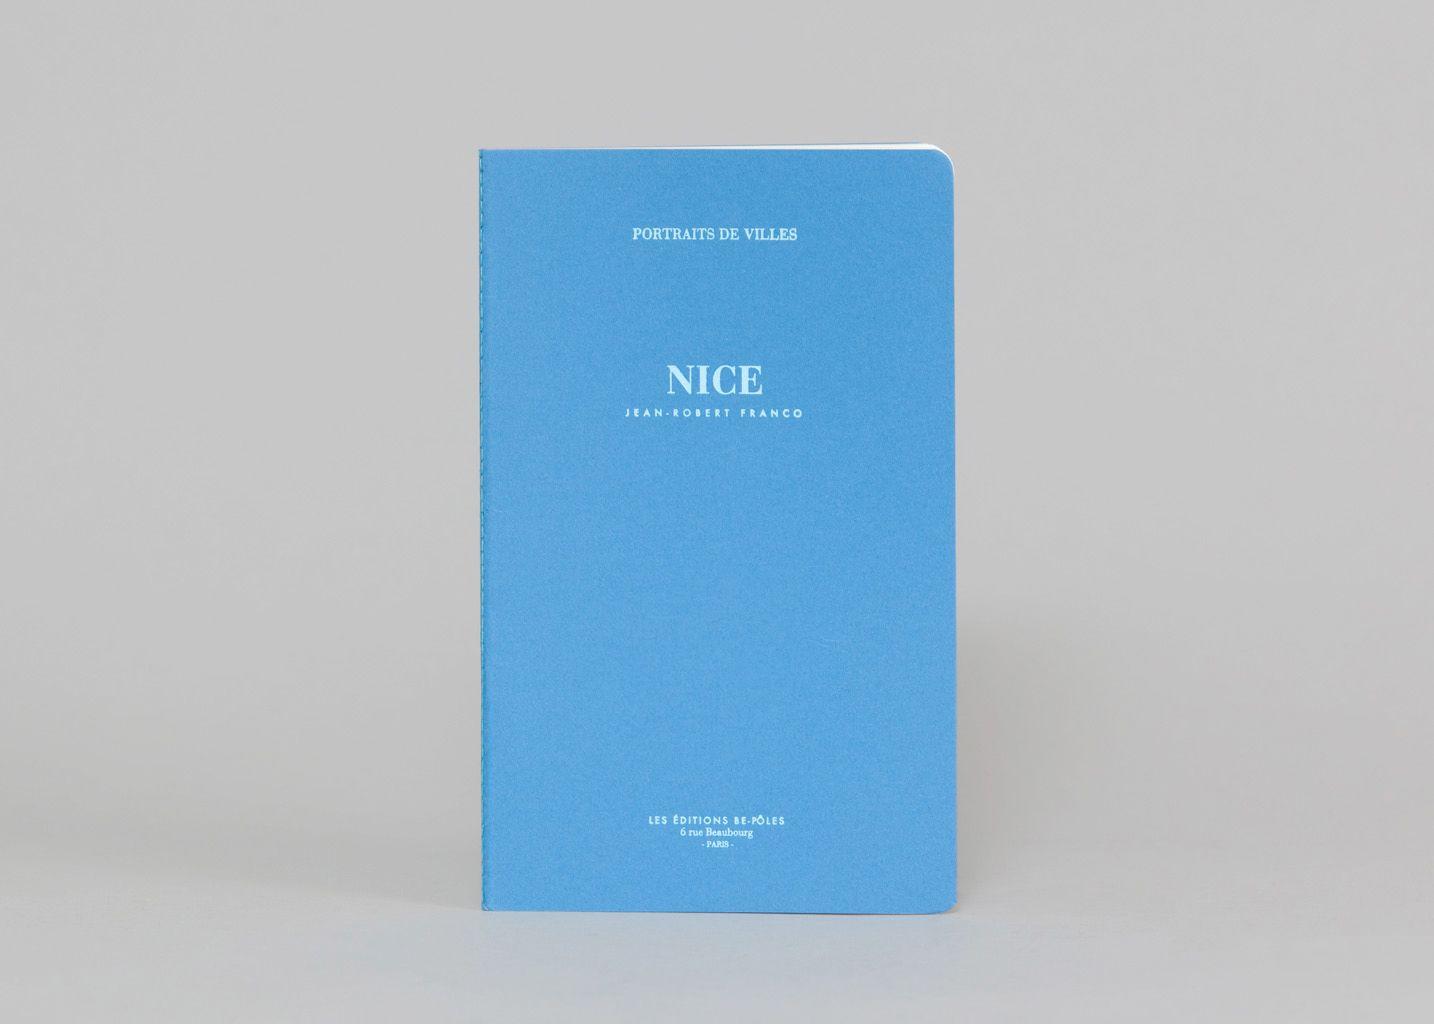 Nice - be-poles